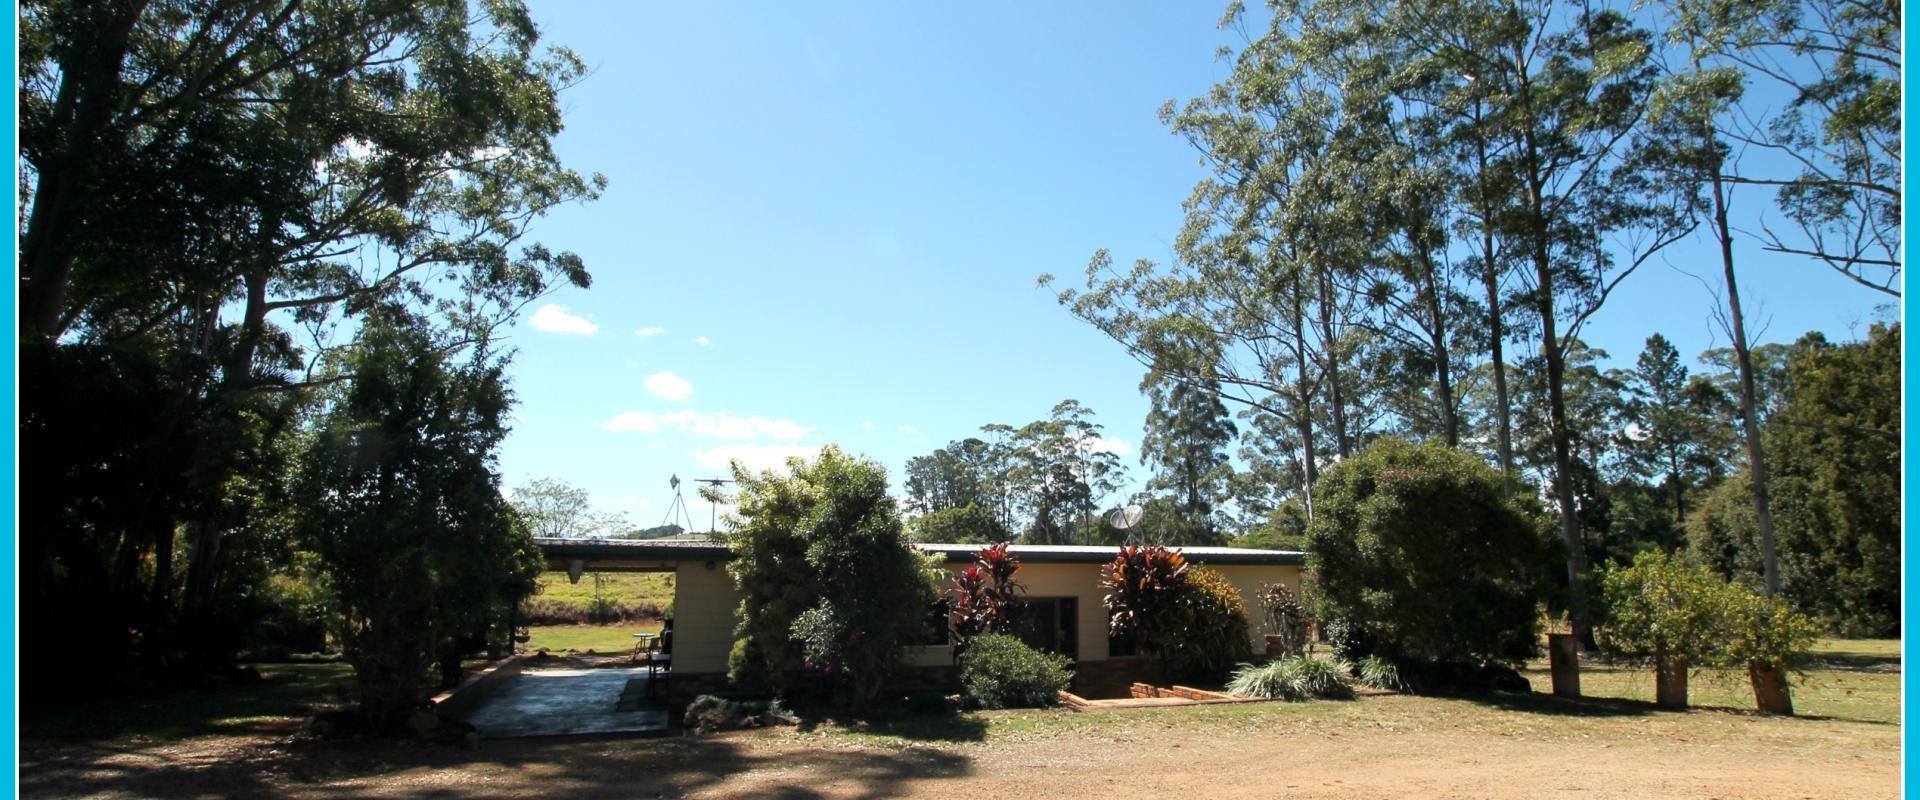 Yungaburra - Tinaroo Realty - Acreage, Dam & House! Great Price